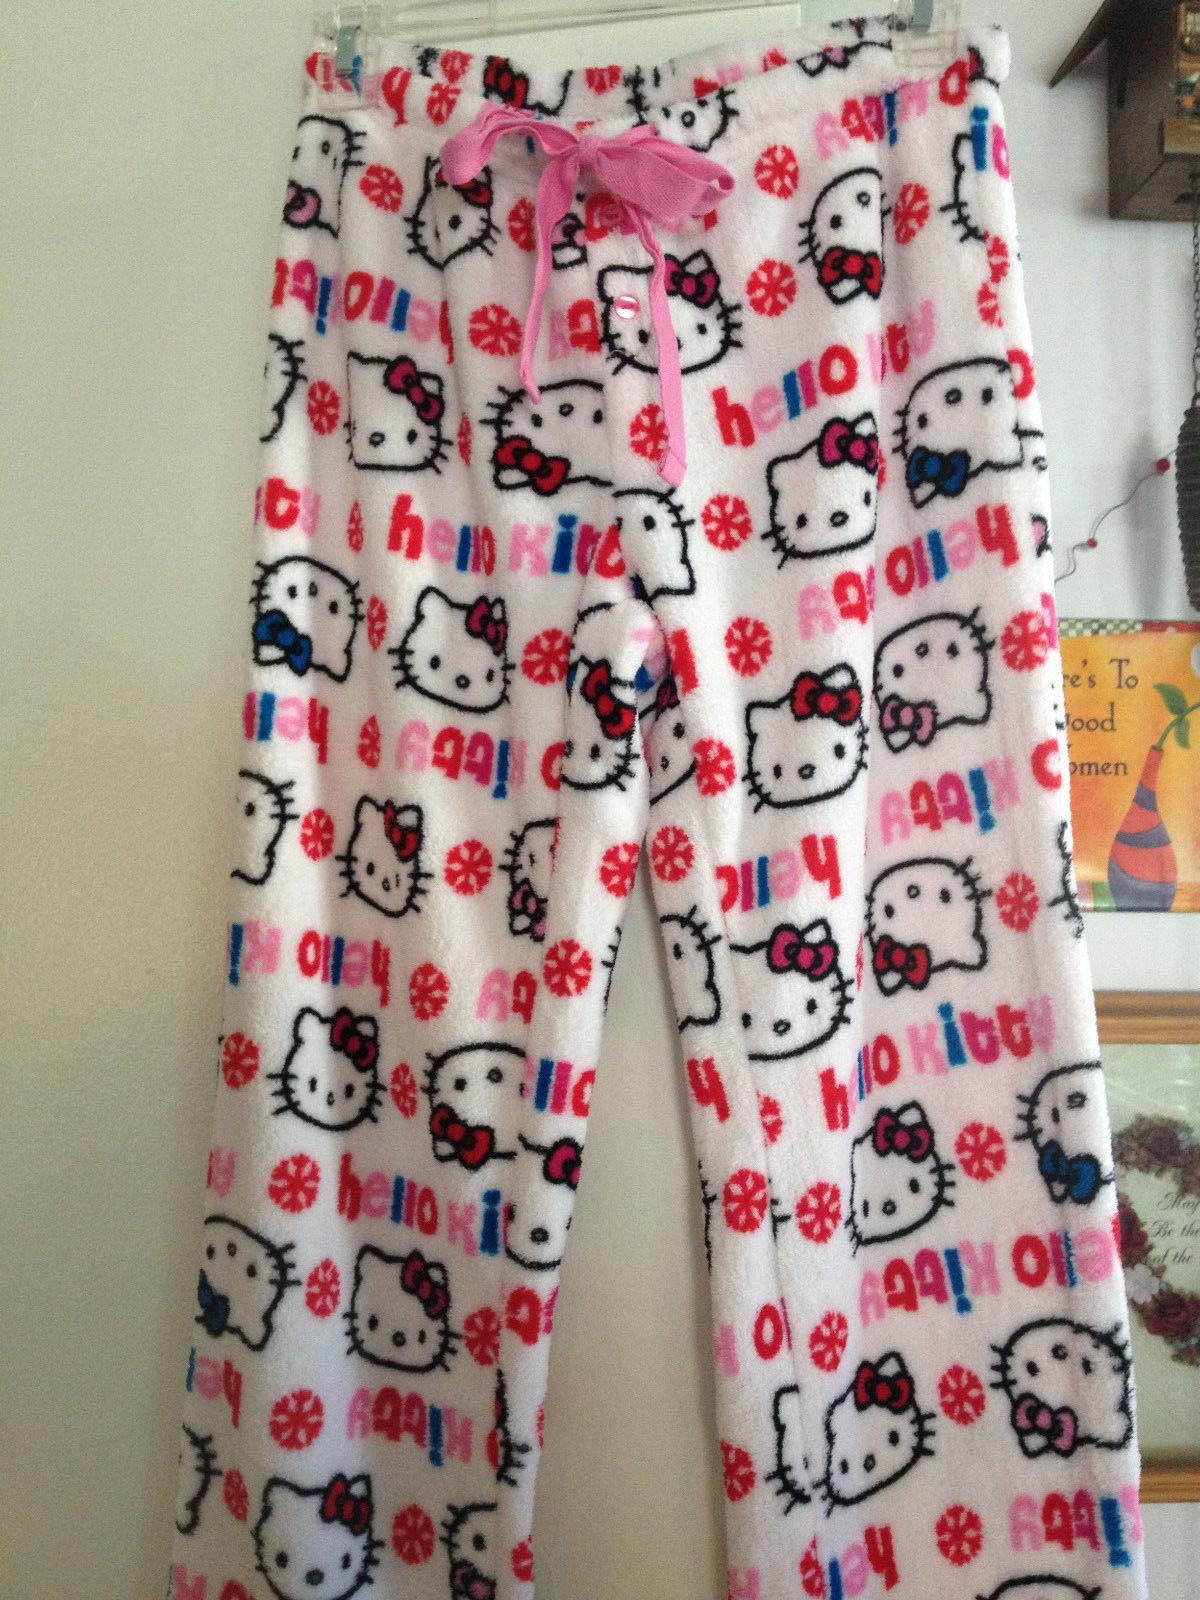 ddbf203a9 S l1600. S l1600. Previous. Girls Hello Kitty Soft Plush Fleece Snowflake  Lounge Pants Sleepwear Small Cute